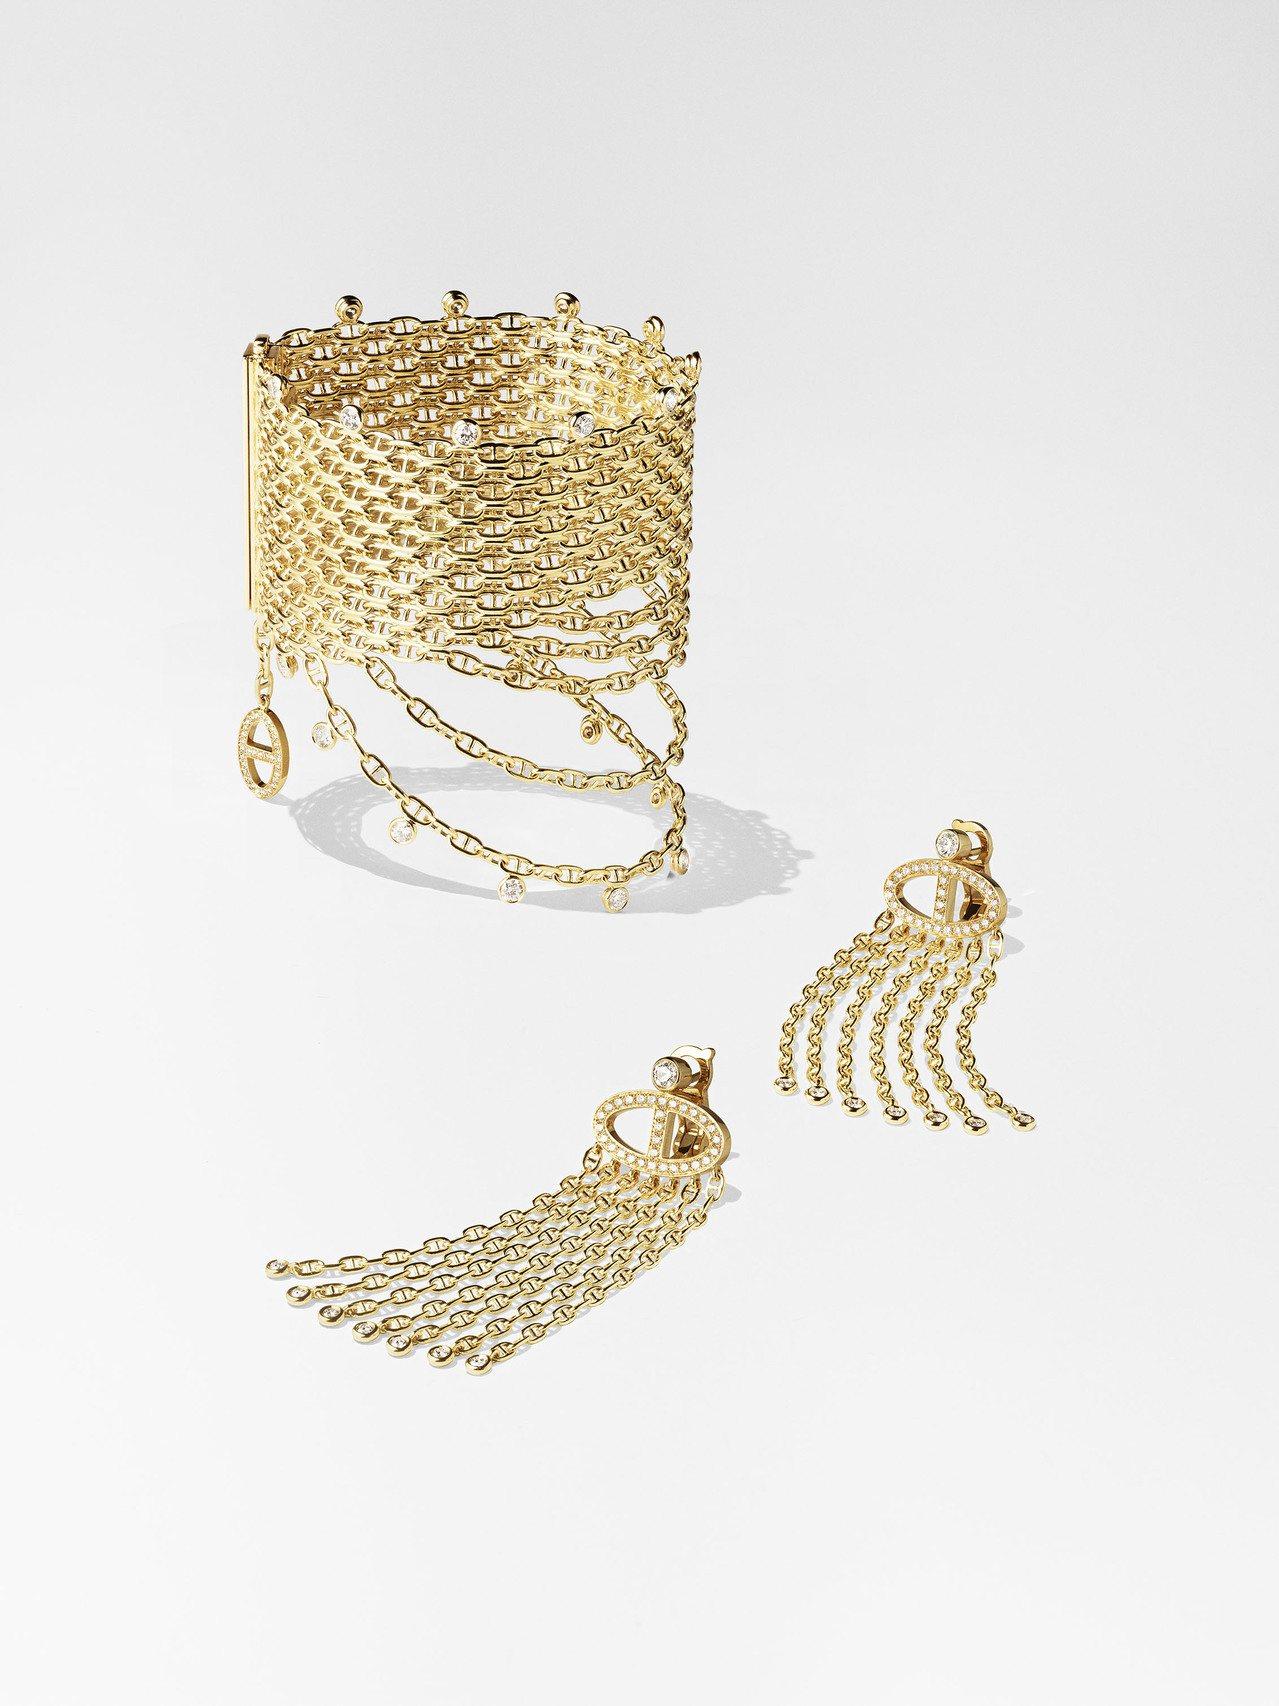 Hermès Voltige黃K金鑲白鑽手環212萬2,900元,多鏈條耳環77...